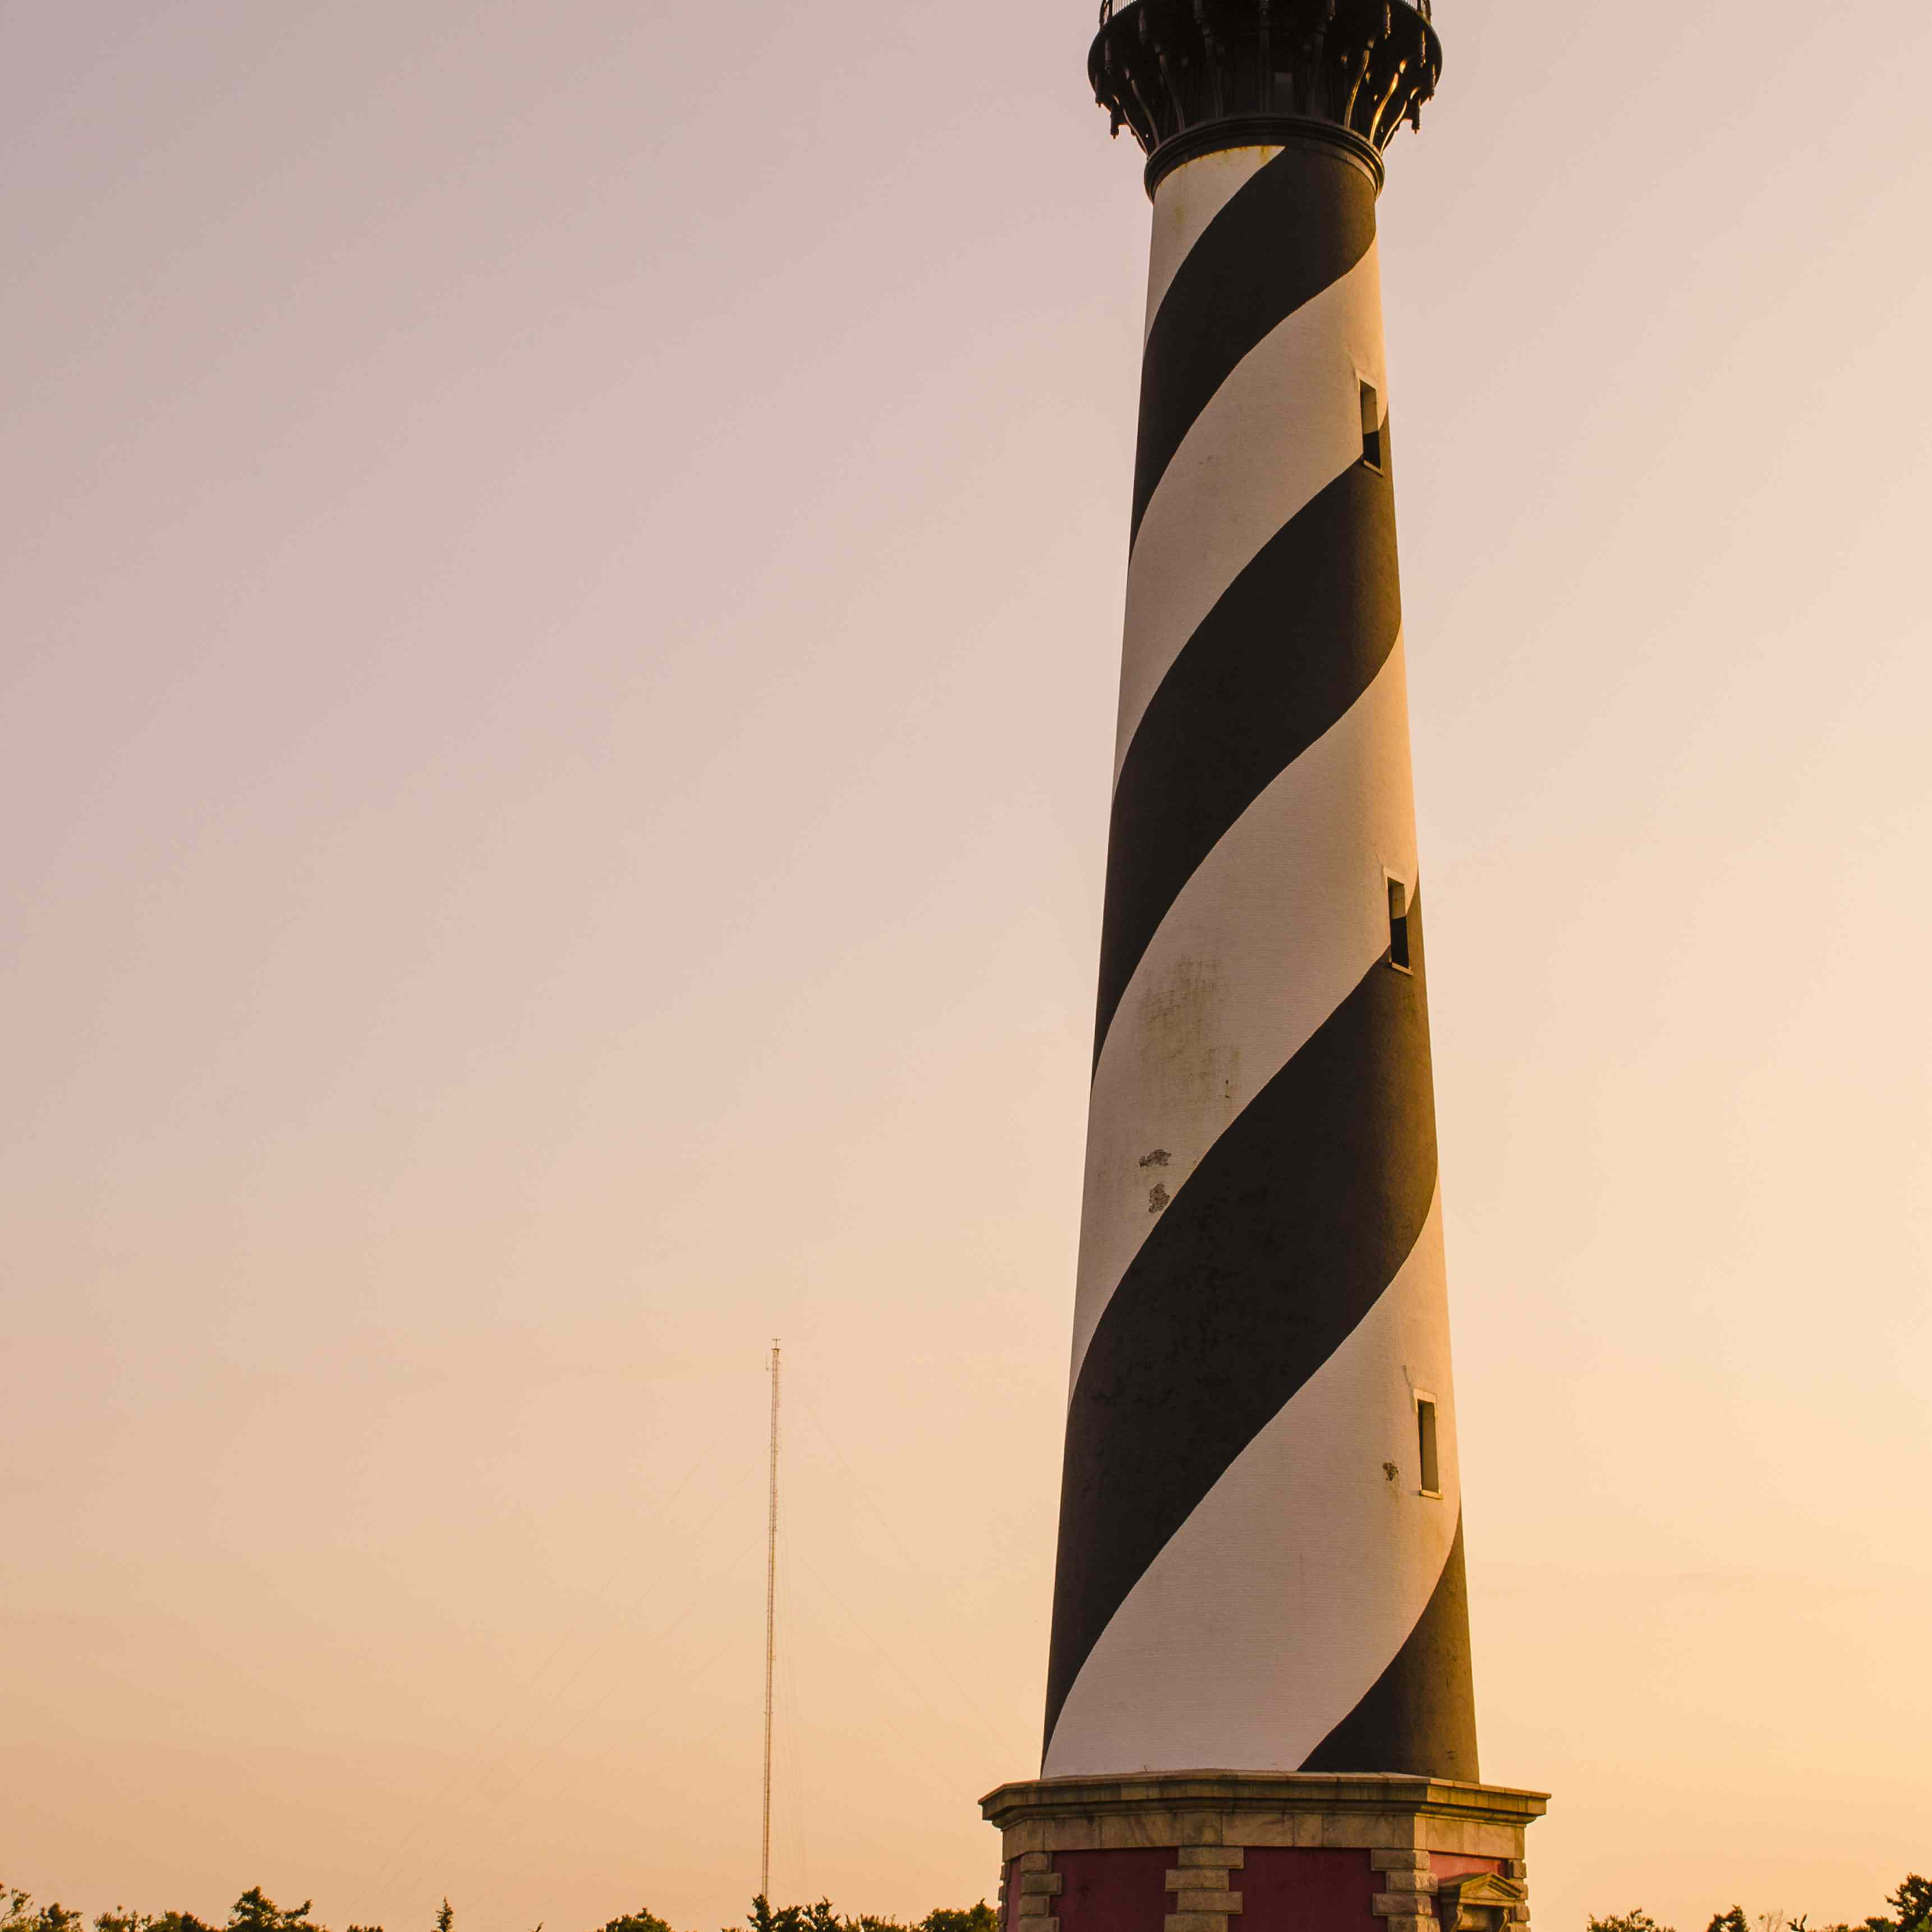 Cape Hatteras Light Station at sunset, Hatteras Island, Outer Banks, North Carolina, USA